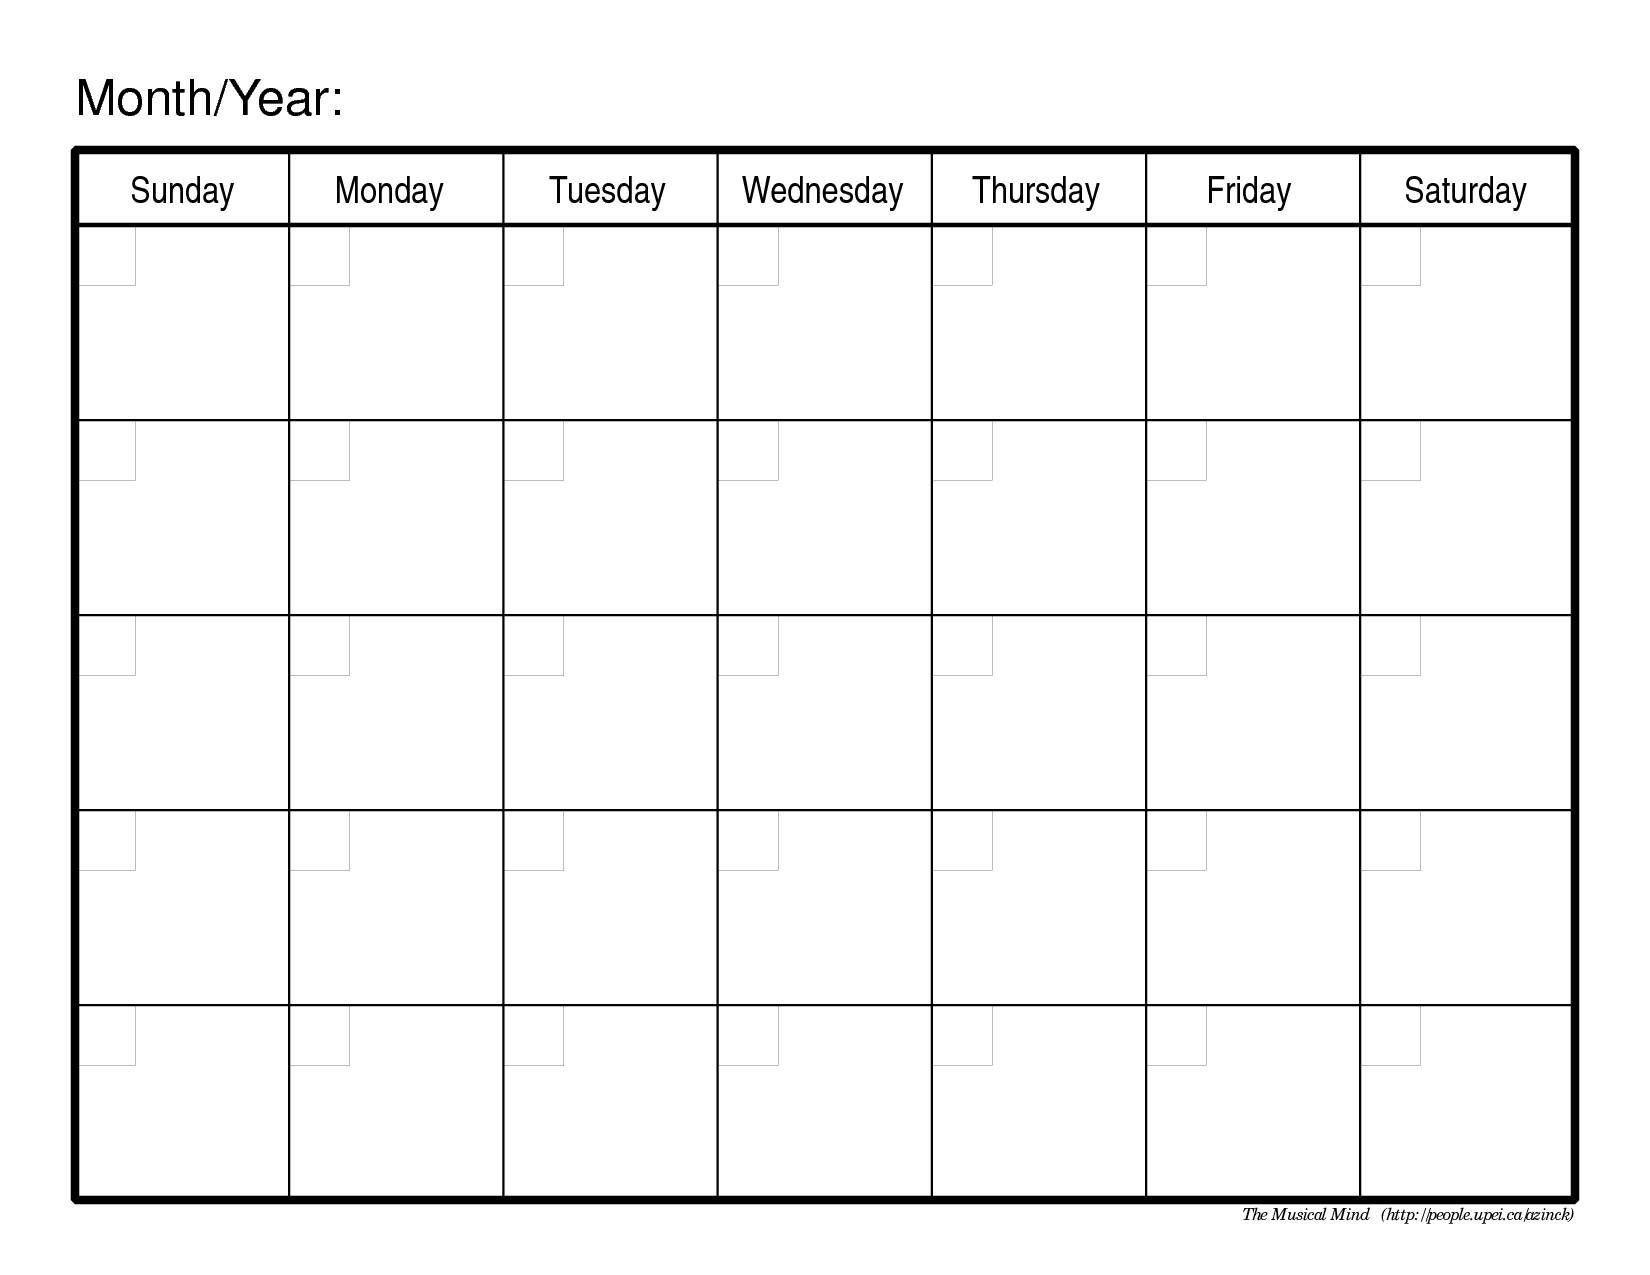 Monthly Calendar No Dates – Printable Week Calendar